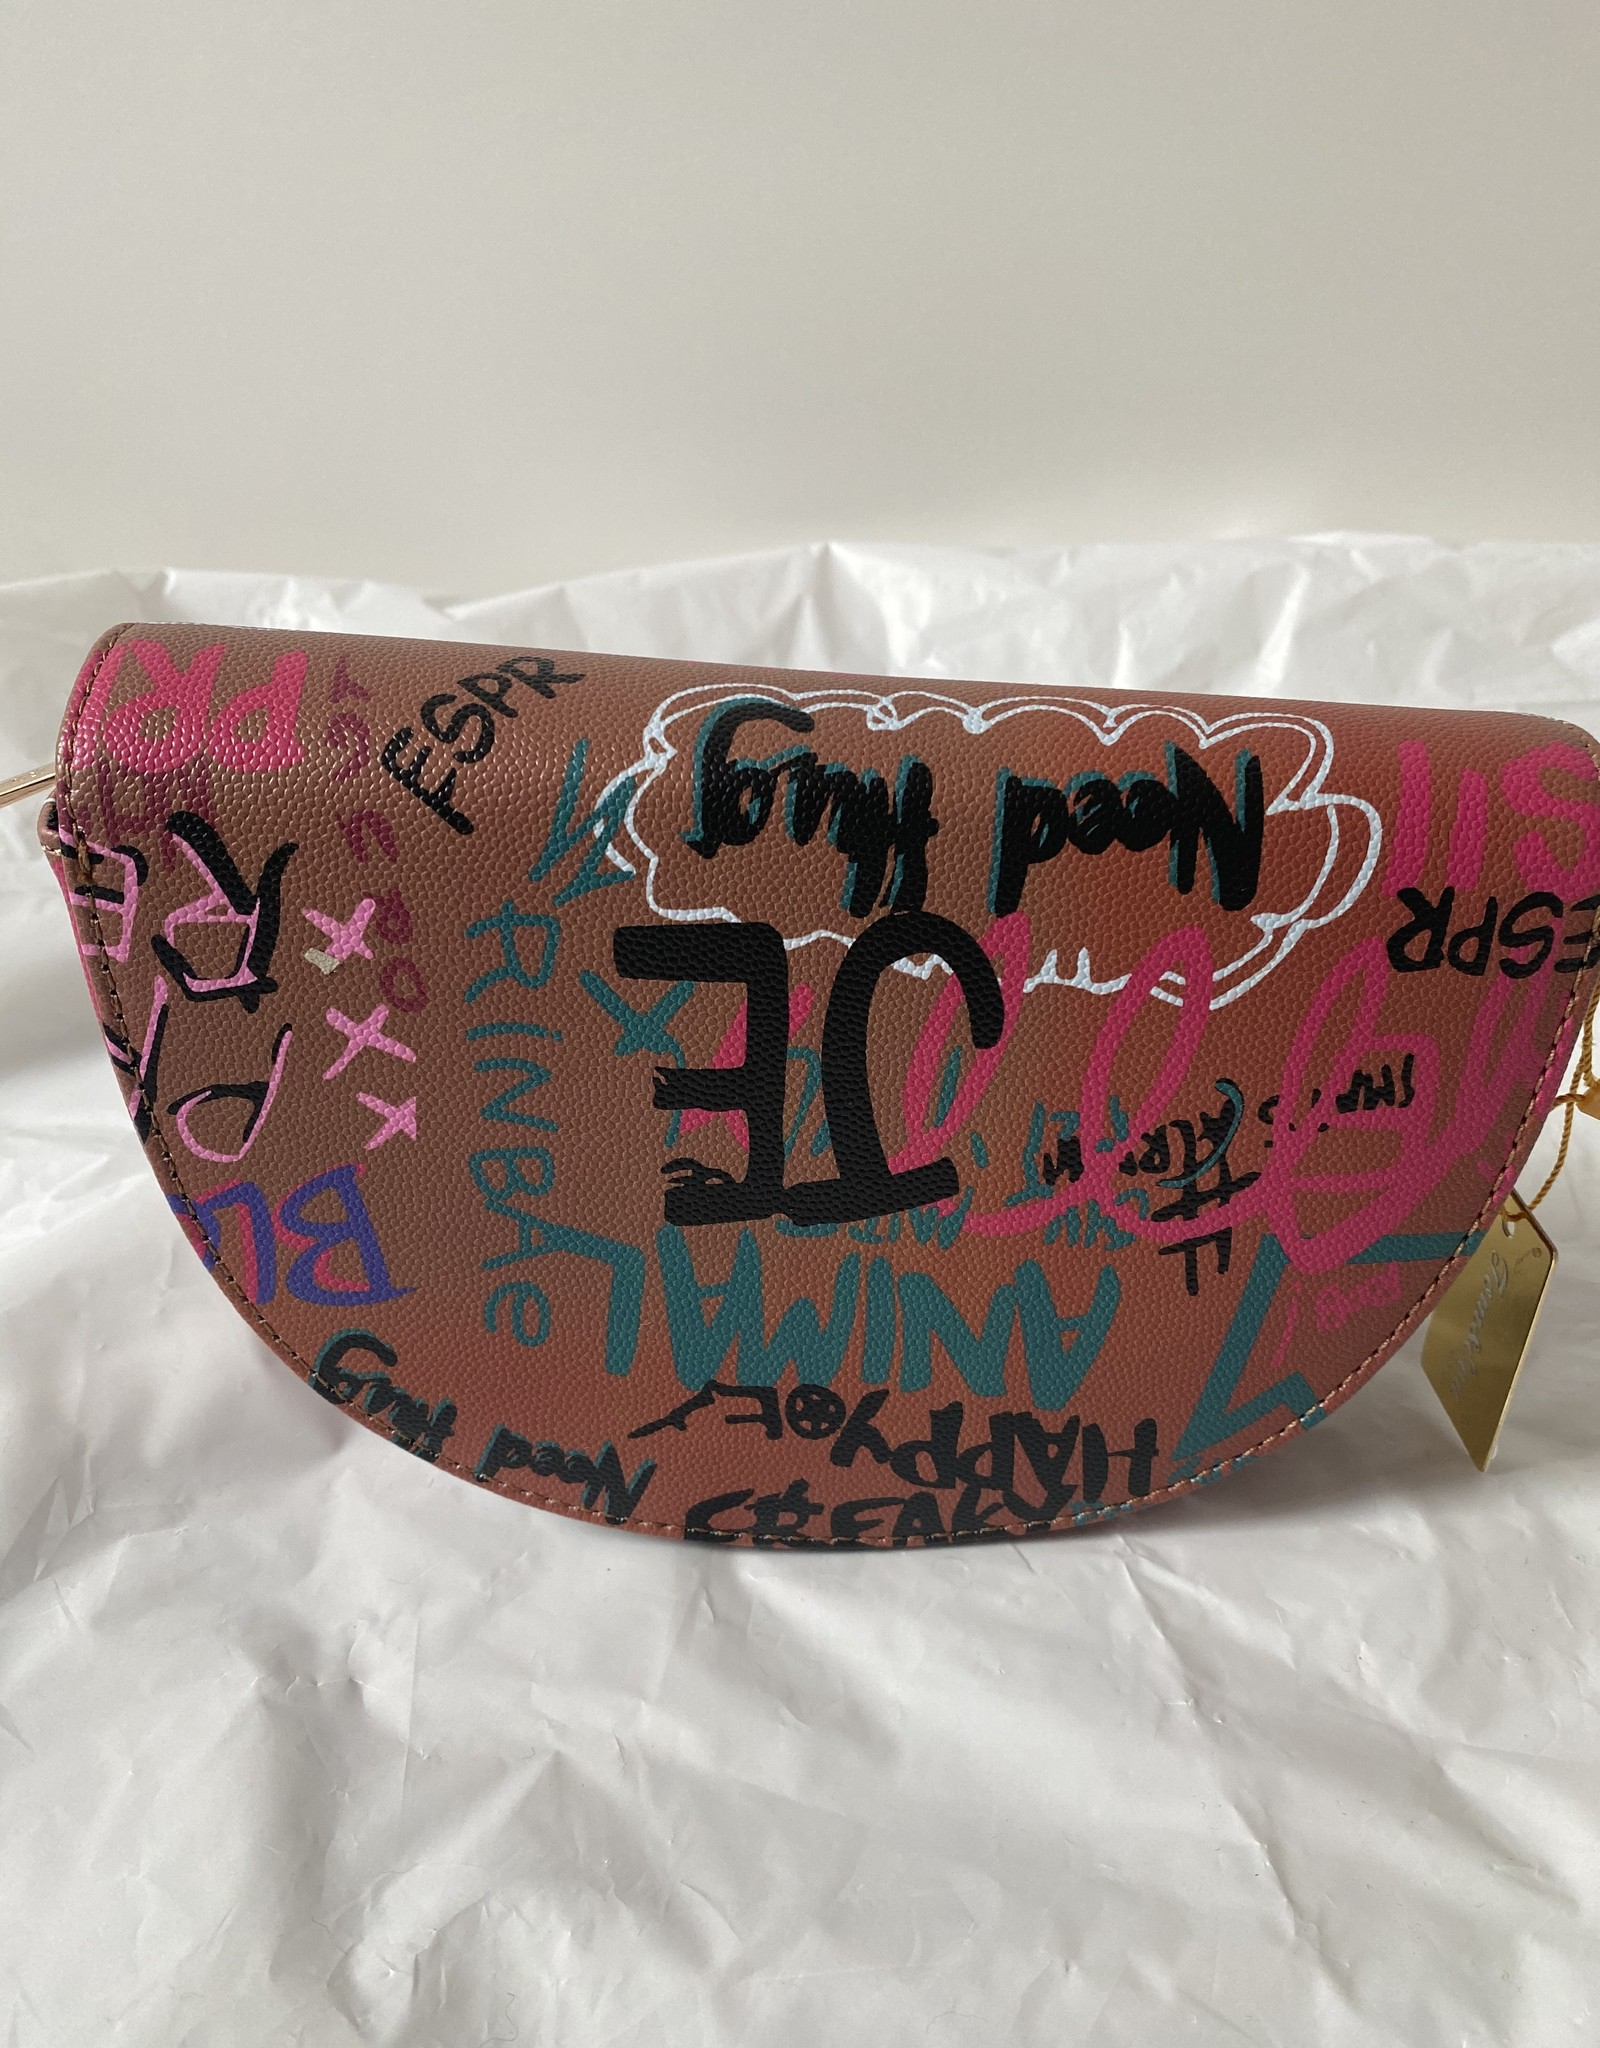 Half moon bag with graffiti.